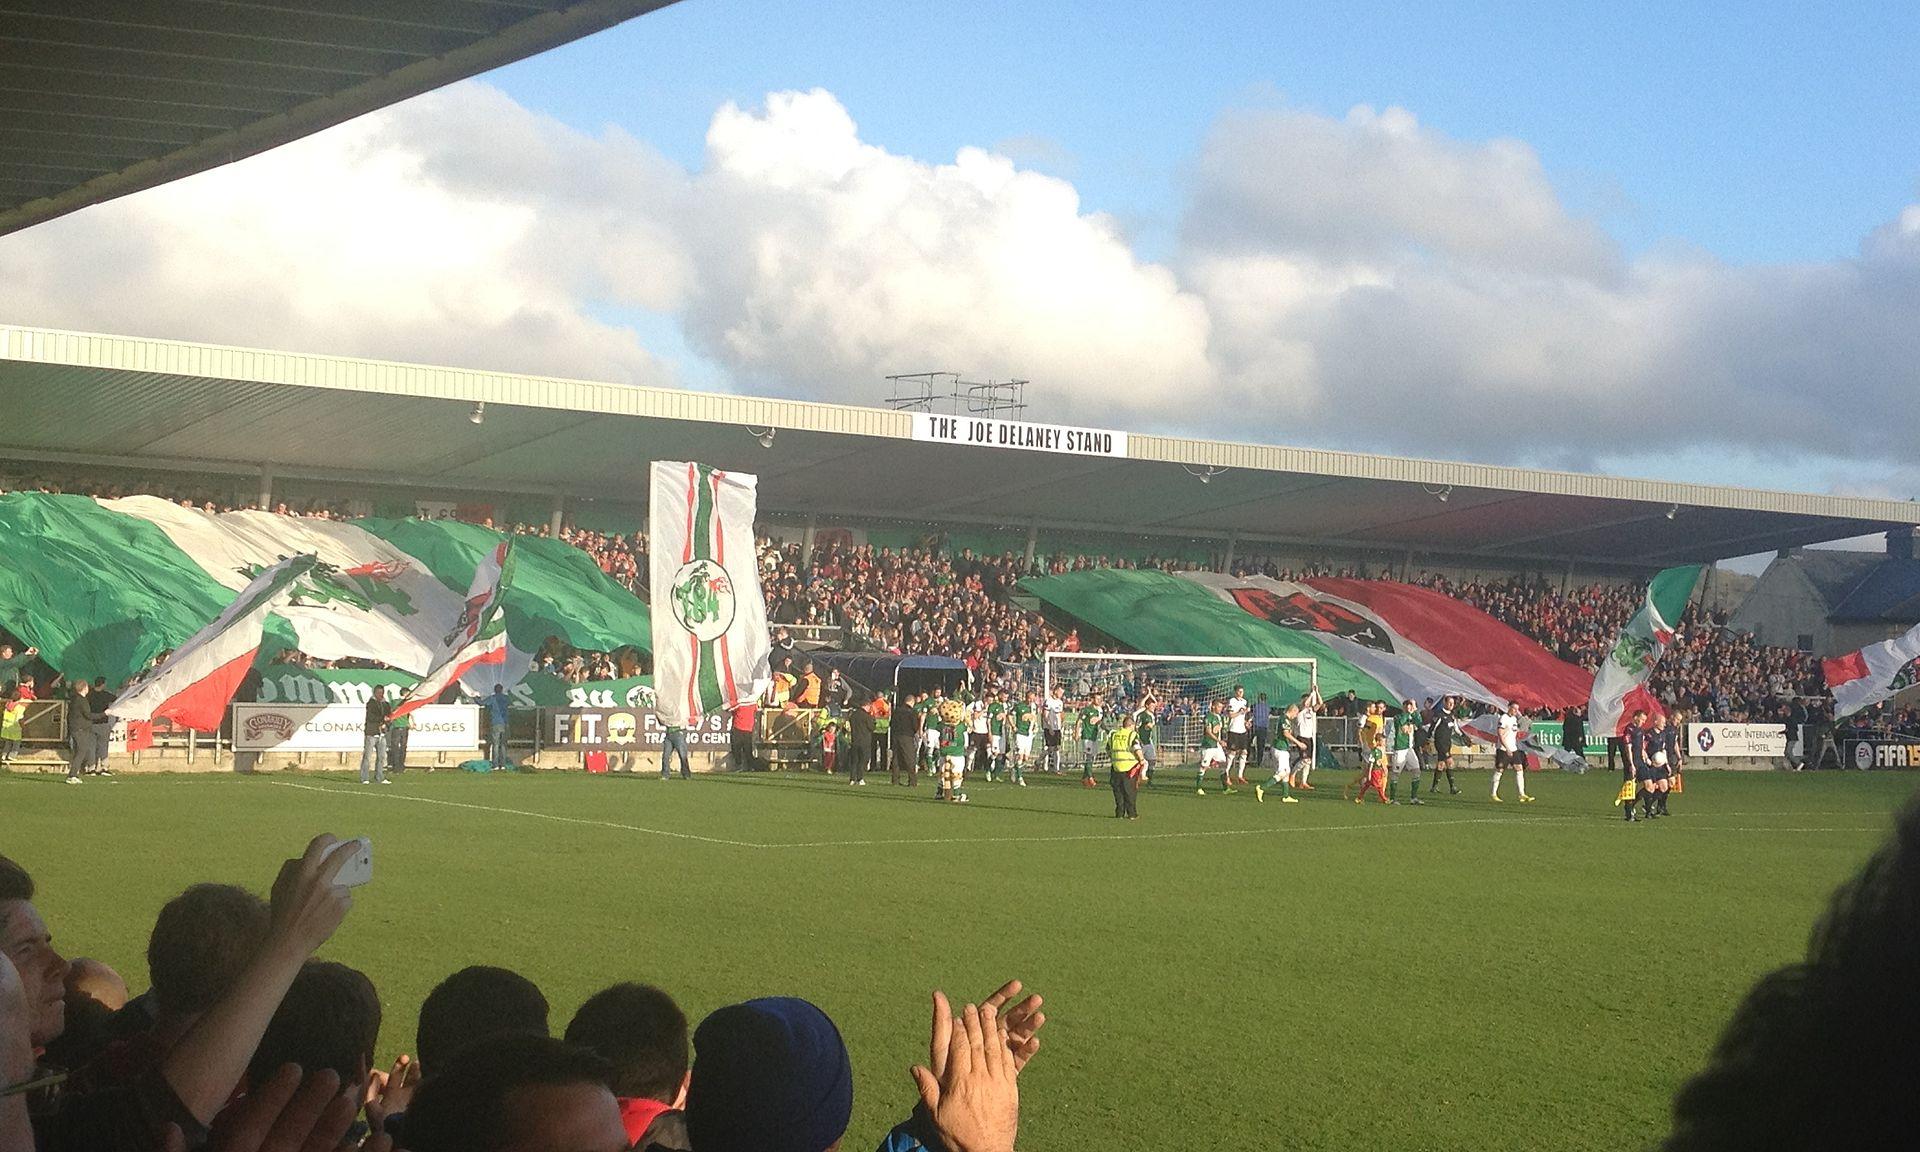 1920px-Turners_Cross_Stadium_Shed_End_Cork_City_v_Dundalk_24_April_2015_1 Planning a Football Trip to 2019 UEFA European Under-17 Championship